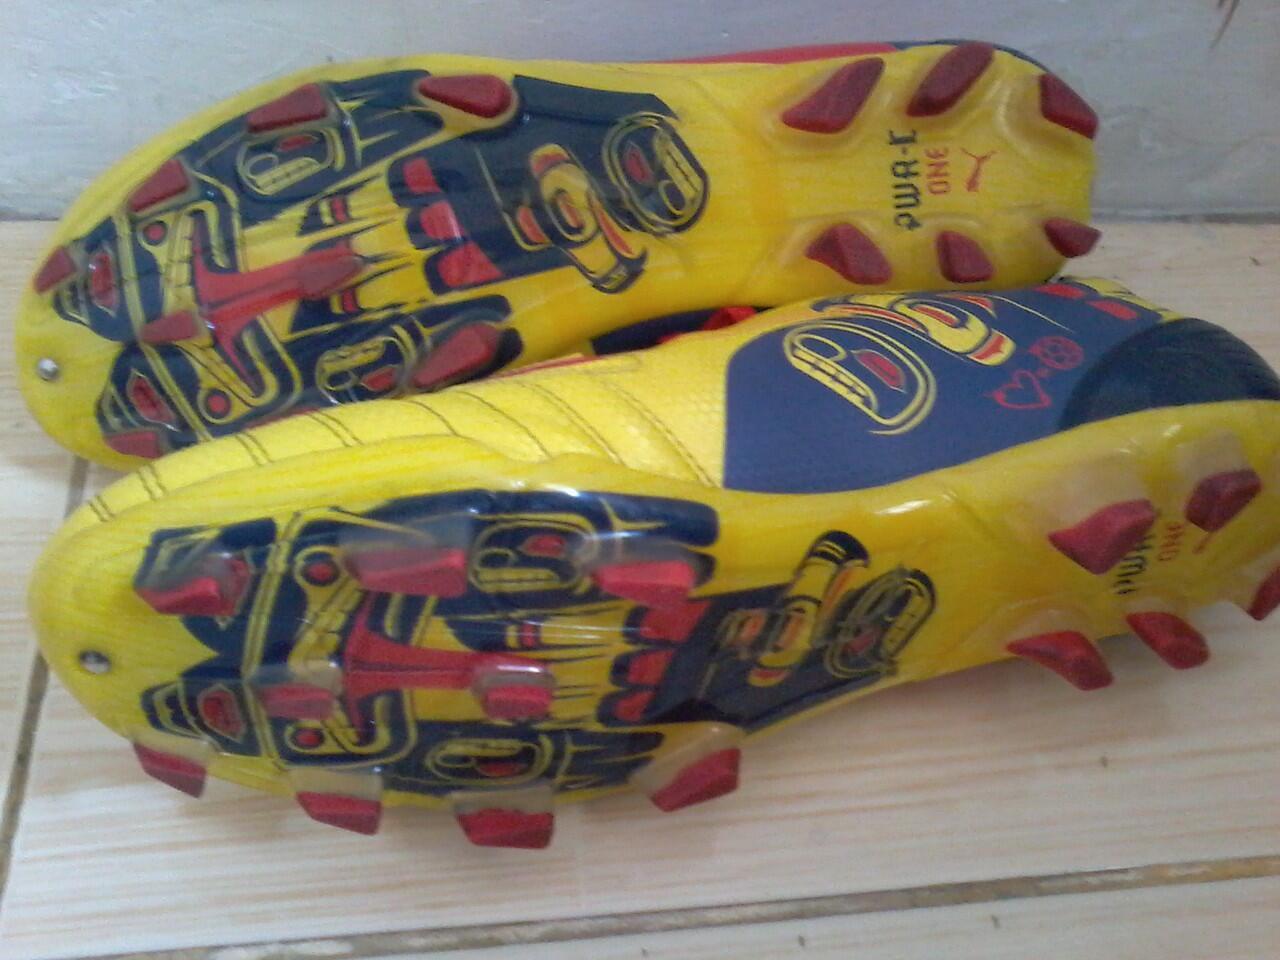 Jual sepatu bola second original puma powercat C-1